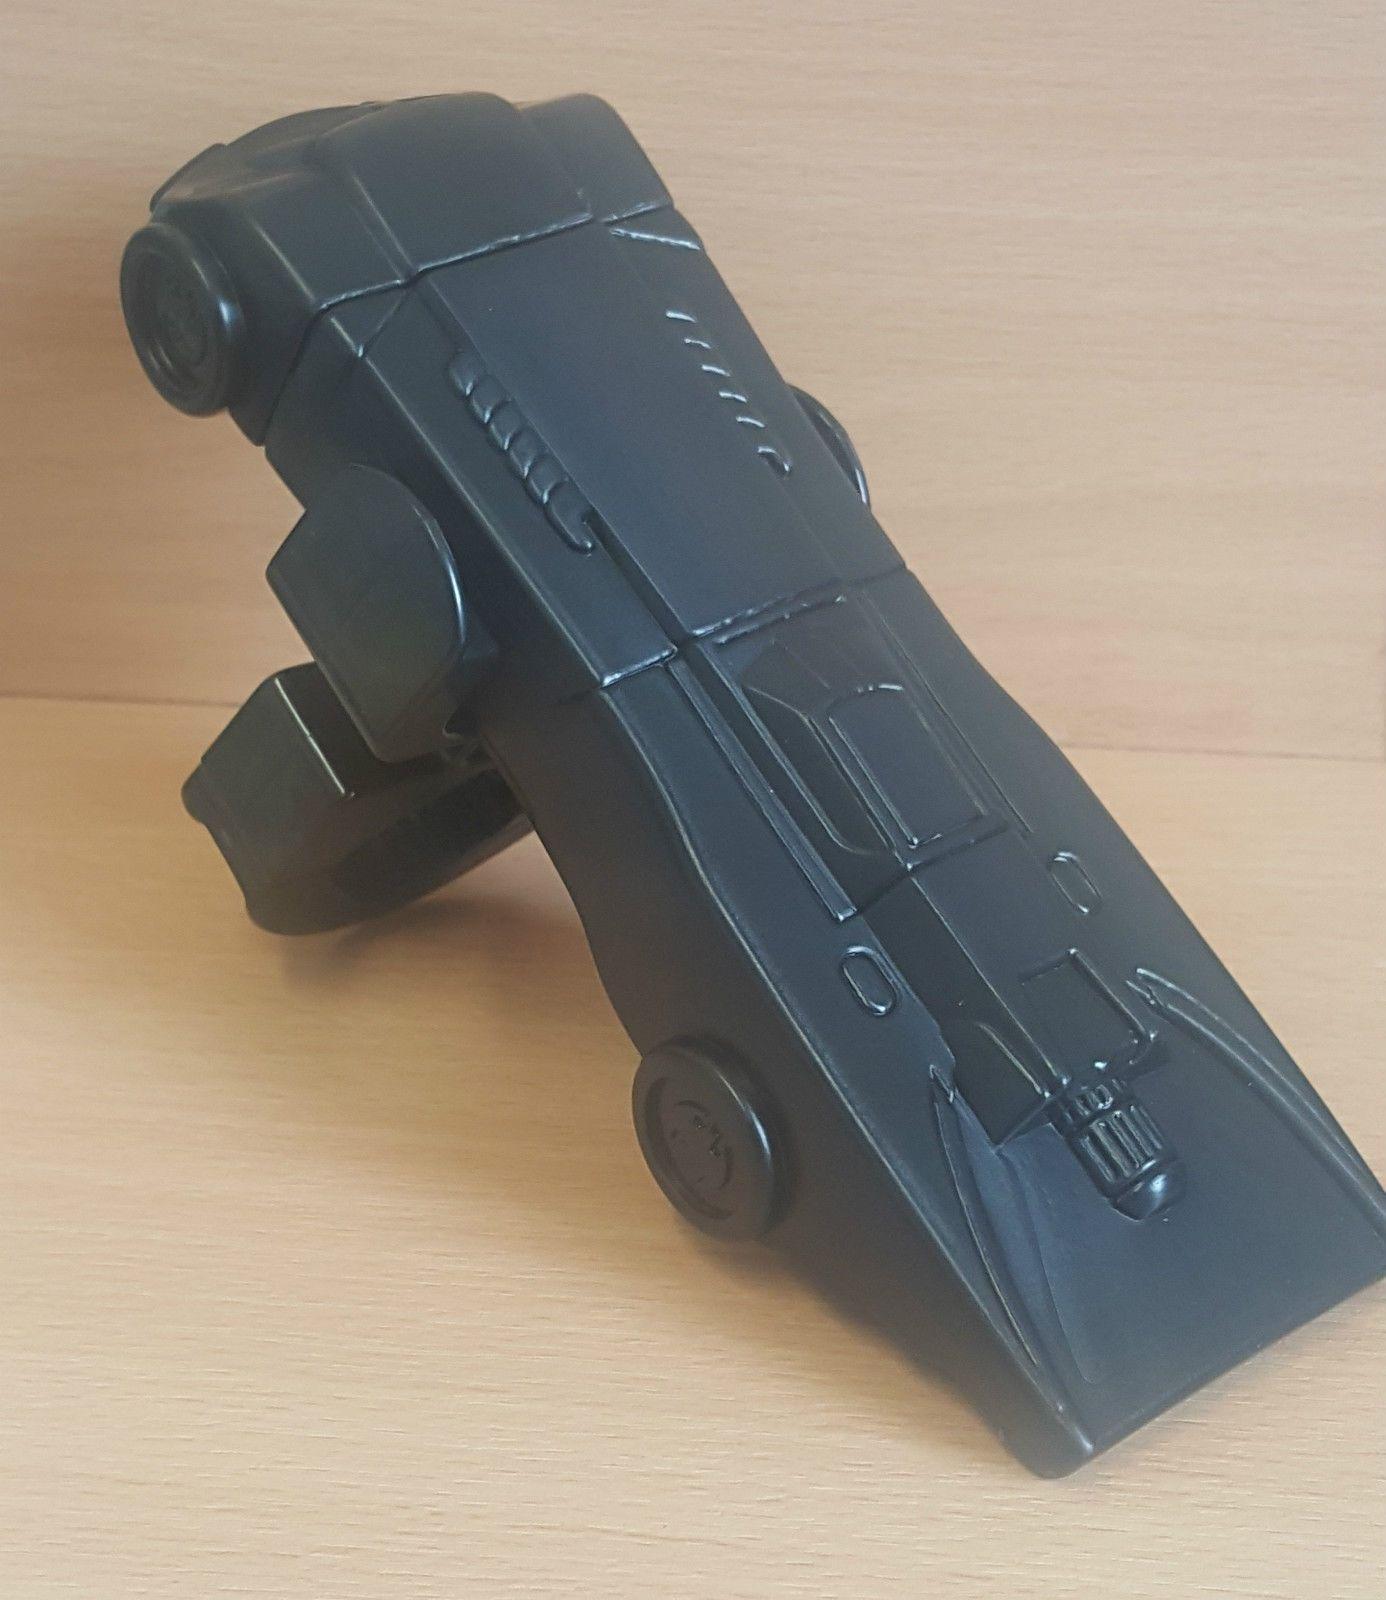 Attachable Accessory Case McDonalds Happy Meal Toy 1996 BATMAN Bike Accessory